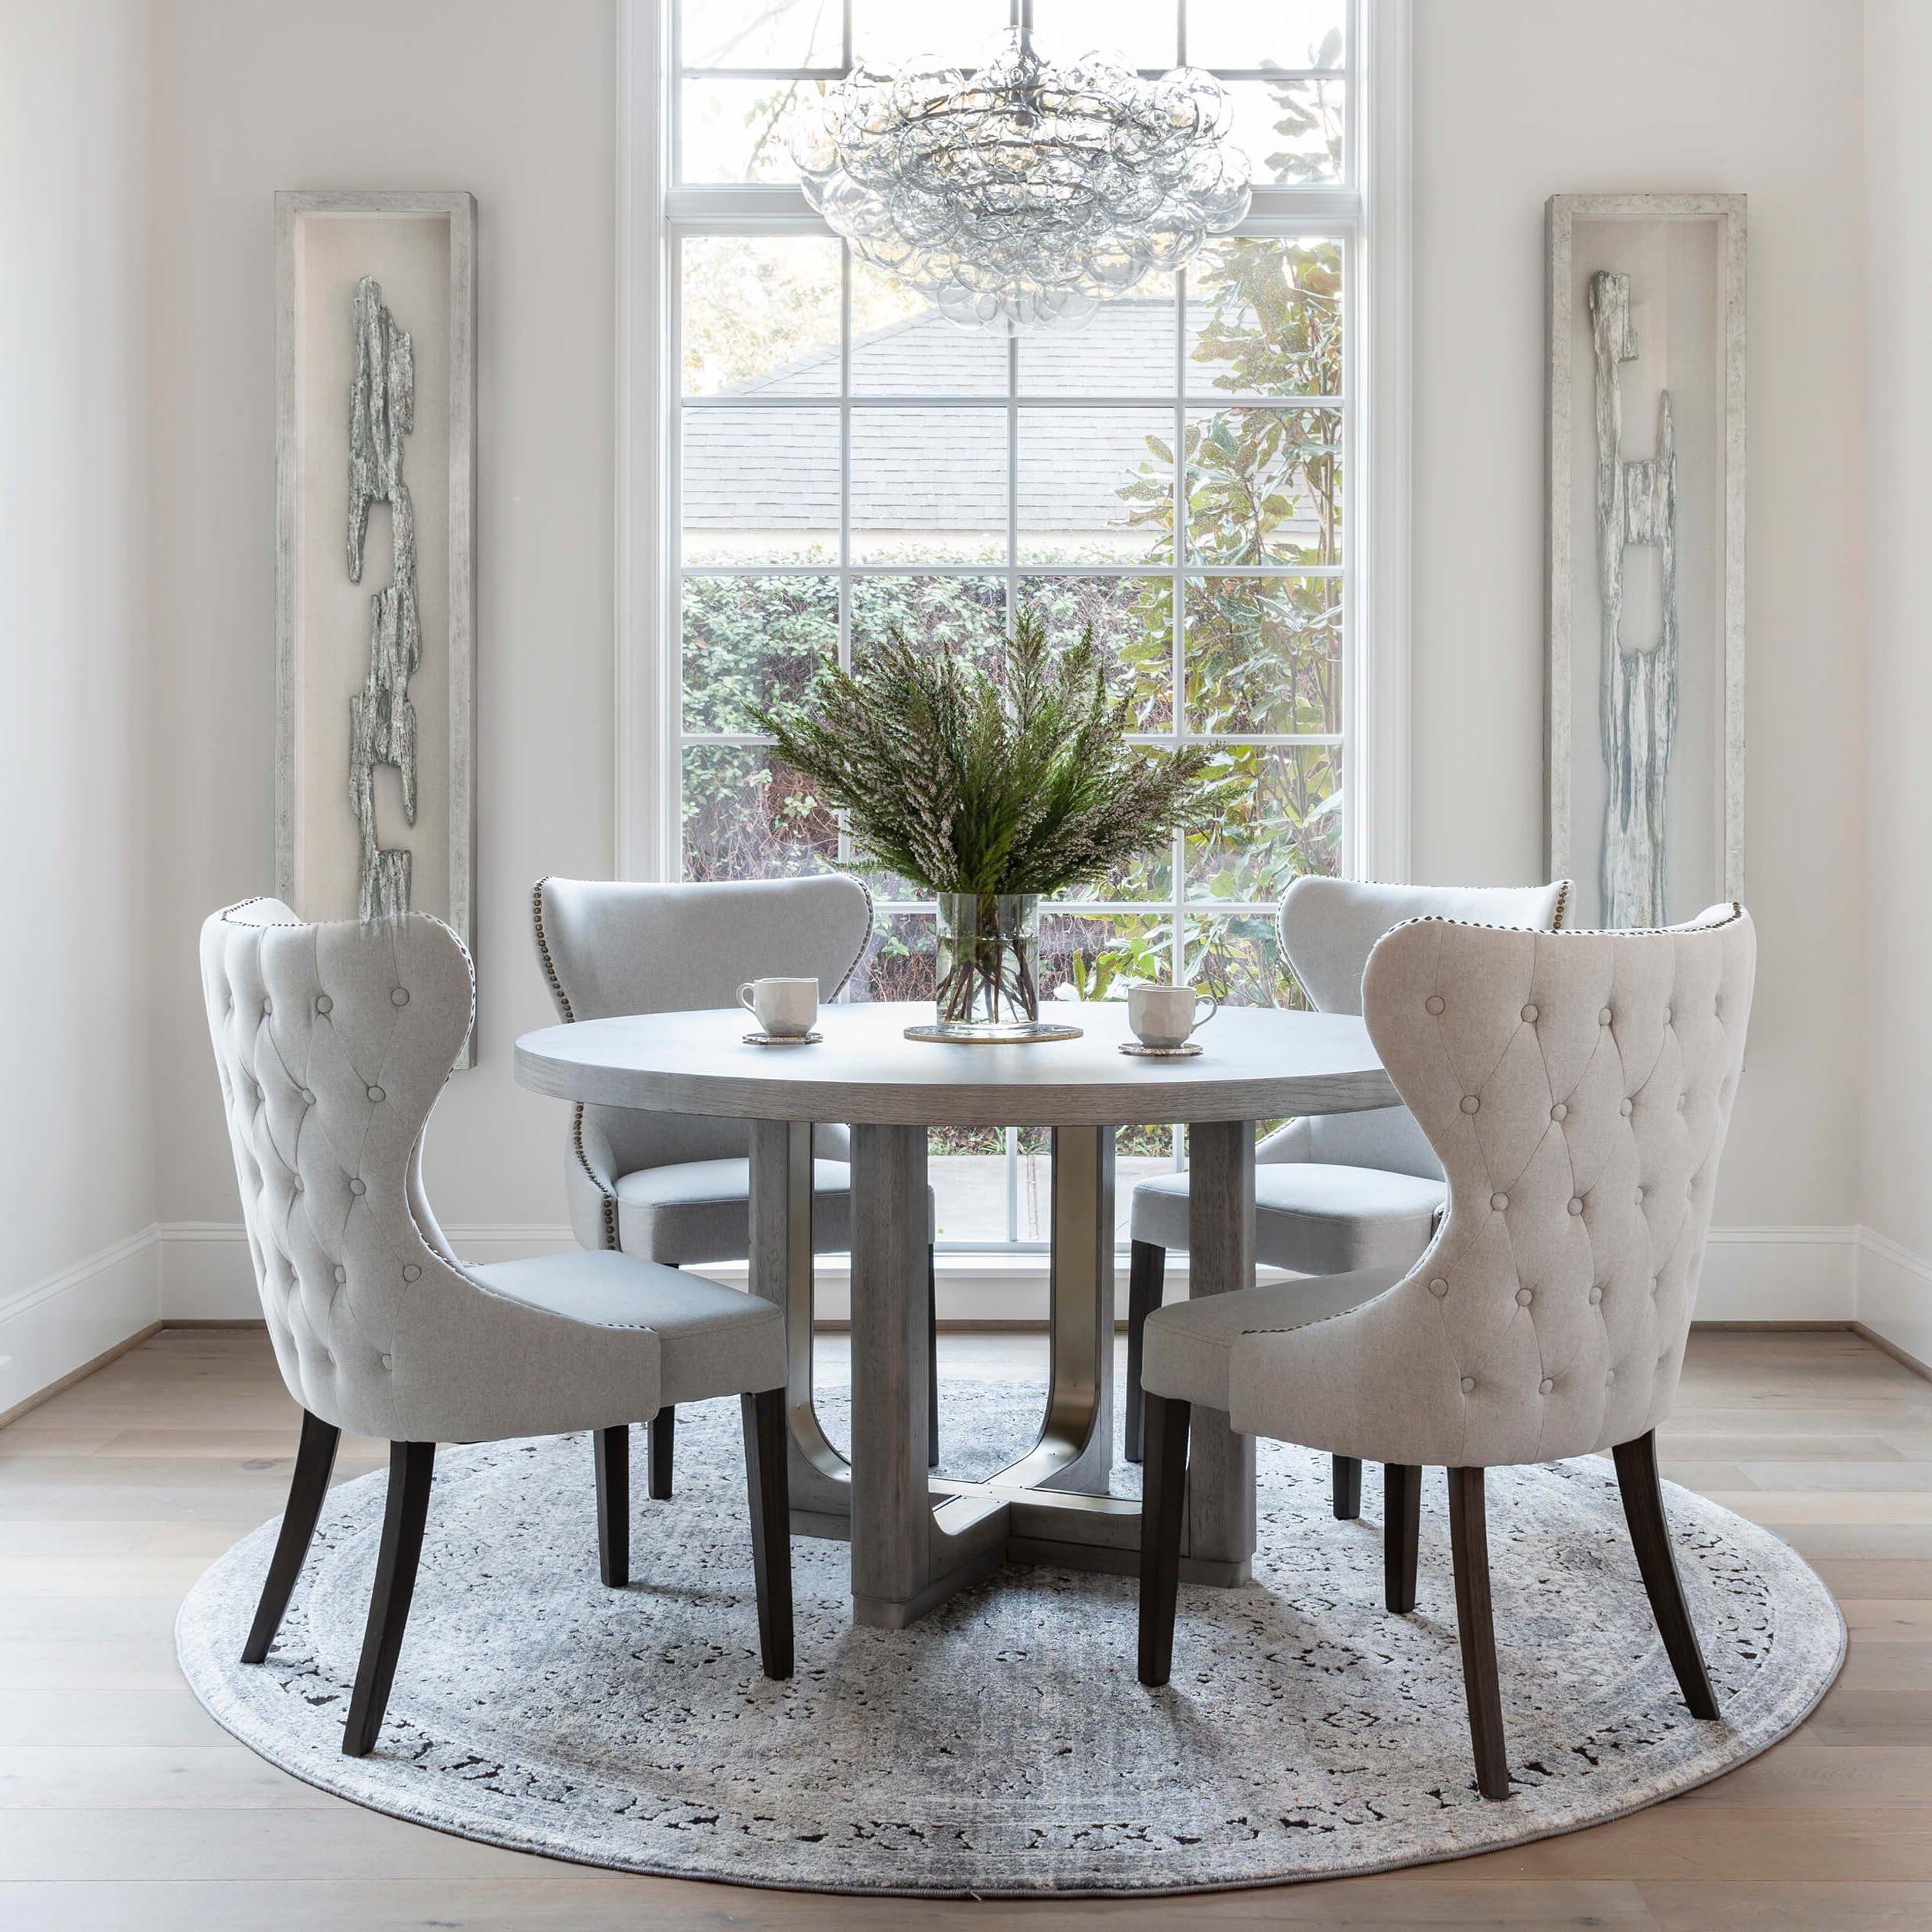 Elegant Regarding Elegance Small Round Dining Tables (View 9 of 30)